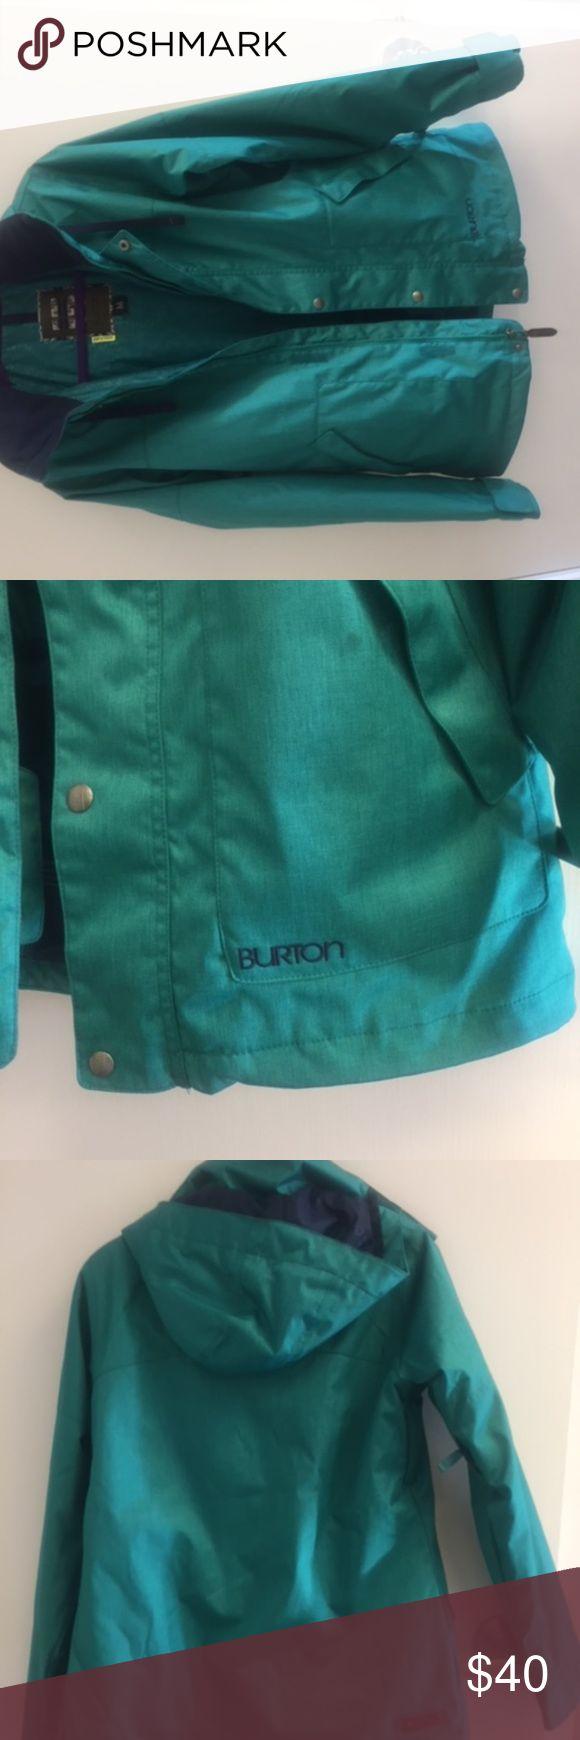 Burton Ski/Board Jacket Burton Insulated Ski/Board Jacket only worn once. Green/Navy   Size M Burton Jackets & Coats